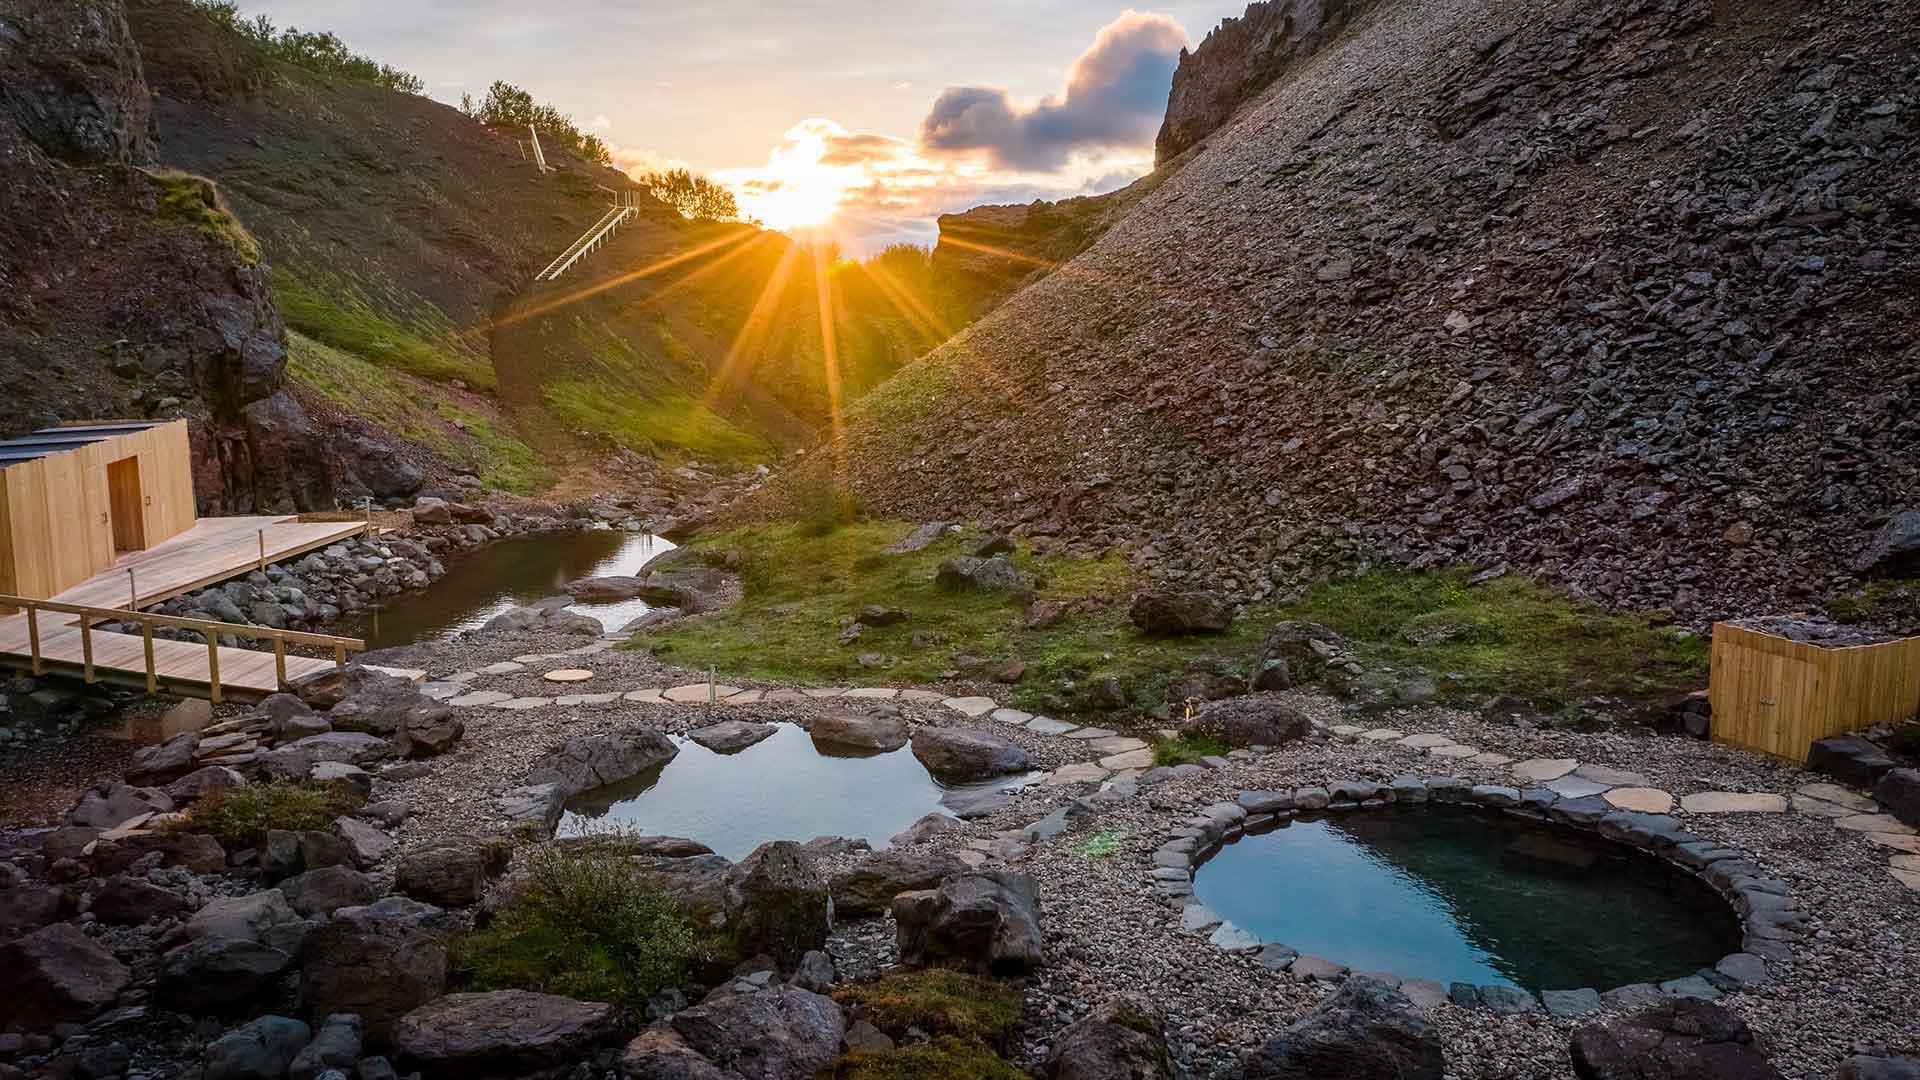 Geothermal Baths in Unusual Landscape opening